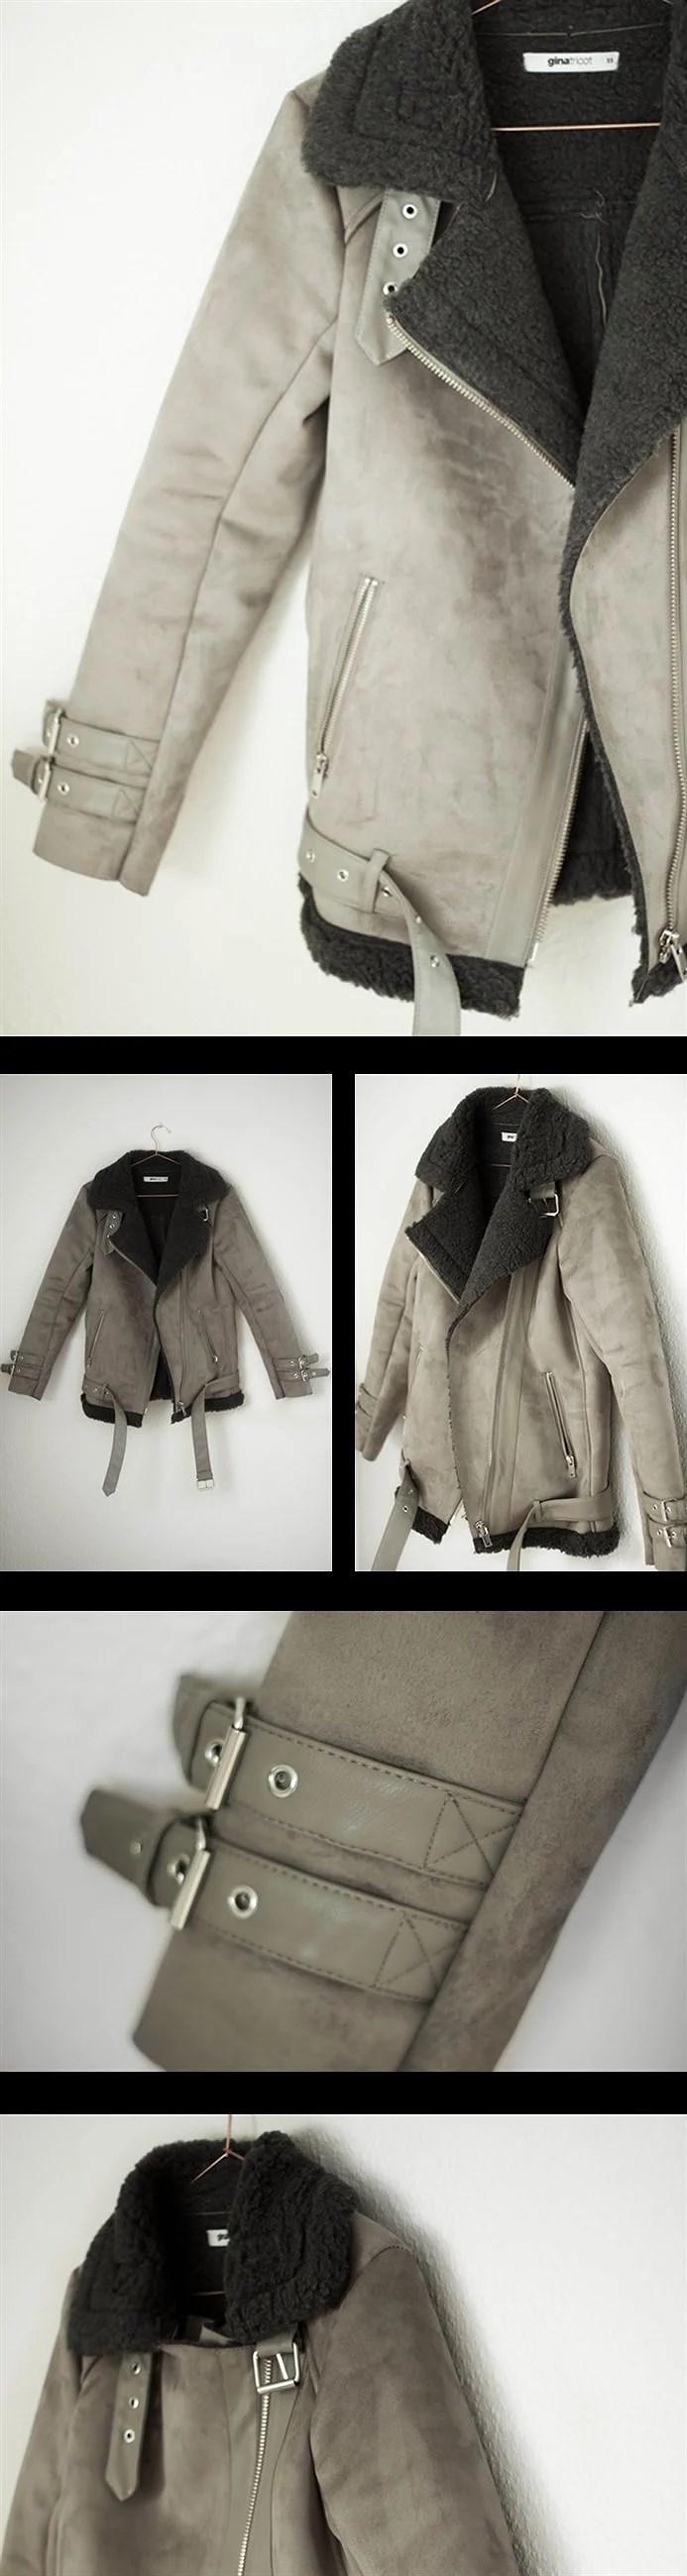 Gina Tricot jacket